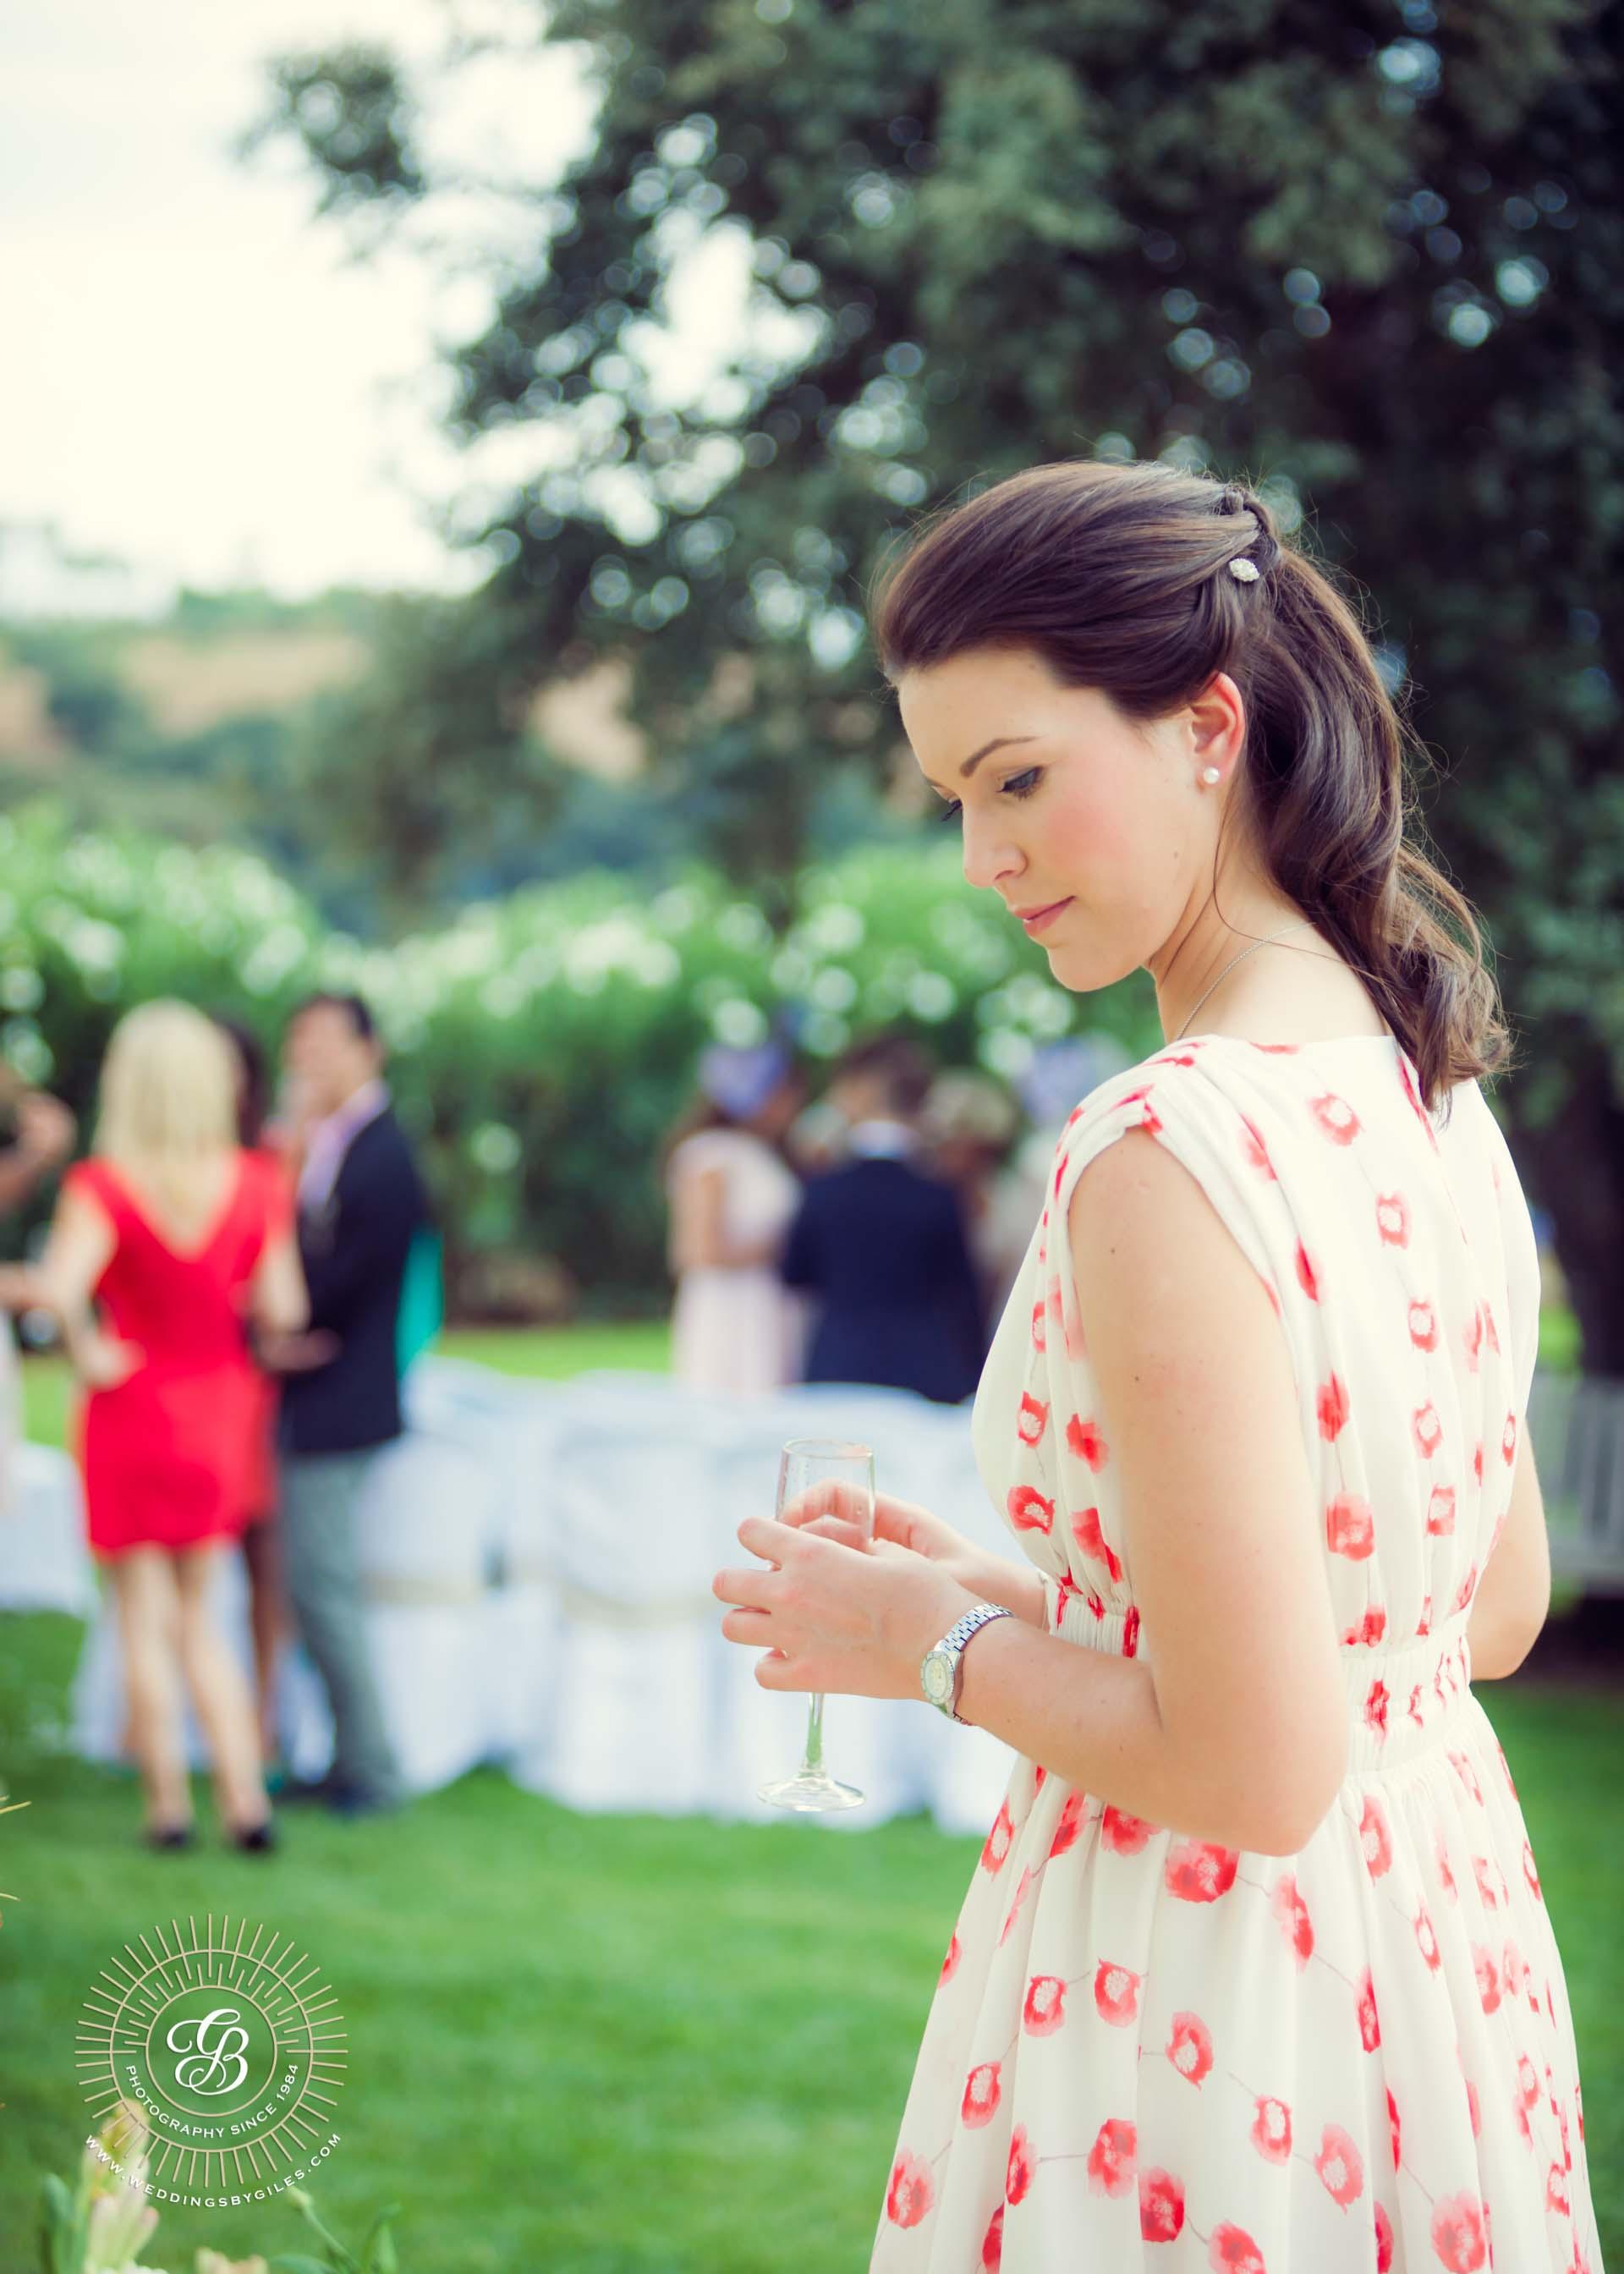 34_bridesmaid in garden wedding